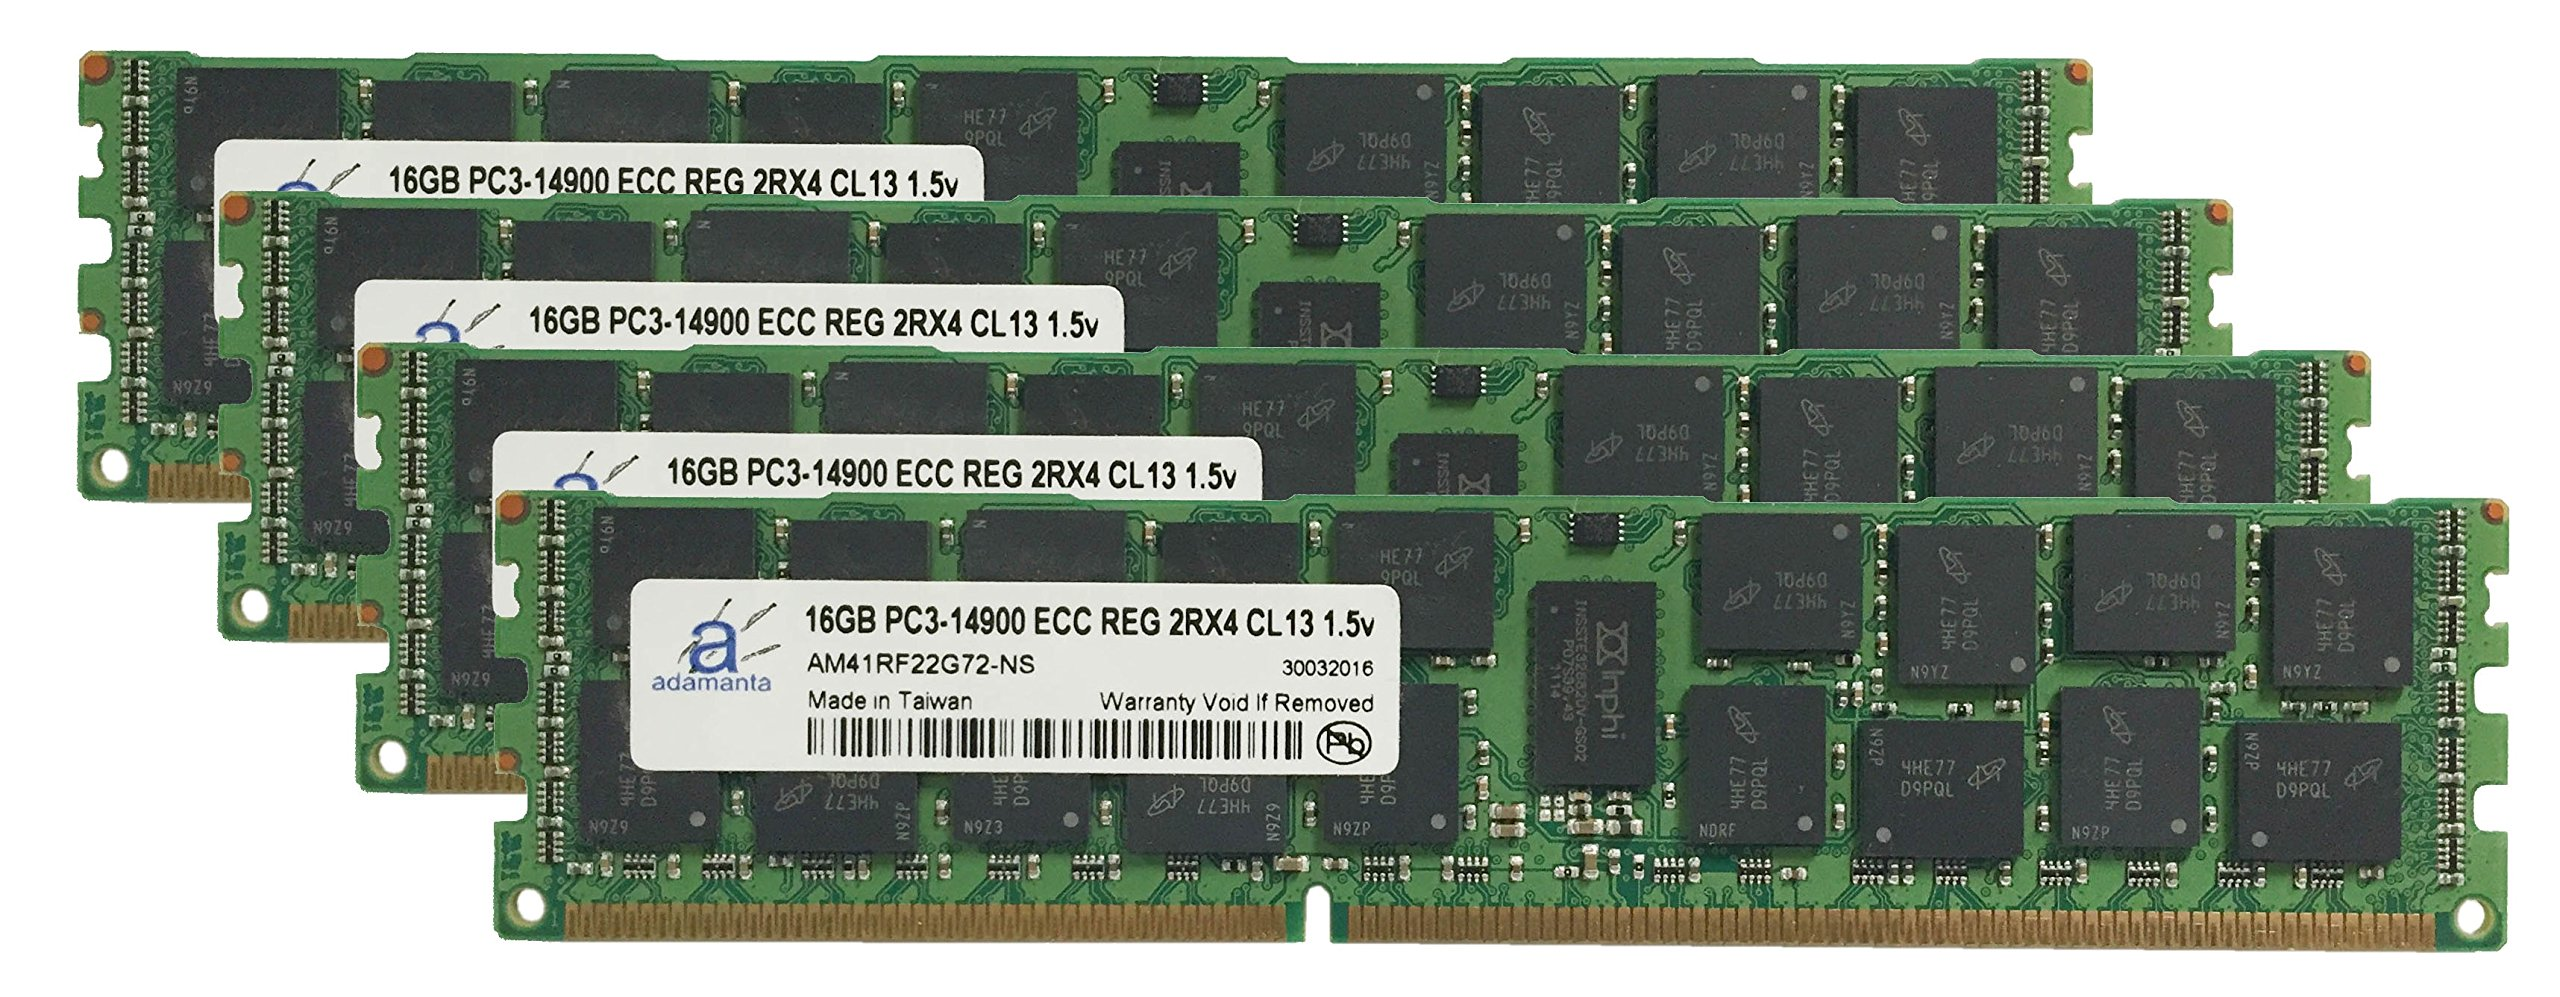 Adamanta 64GB (4x16GB) Server Memory Upgrade for Dell PowerEdge T620 DDR3 1866Mhz PC3-14900 ECC Registered 2Rx4 CL13 1.5v